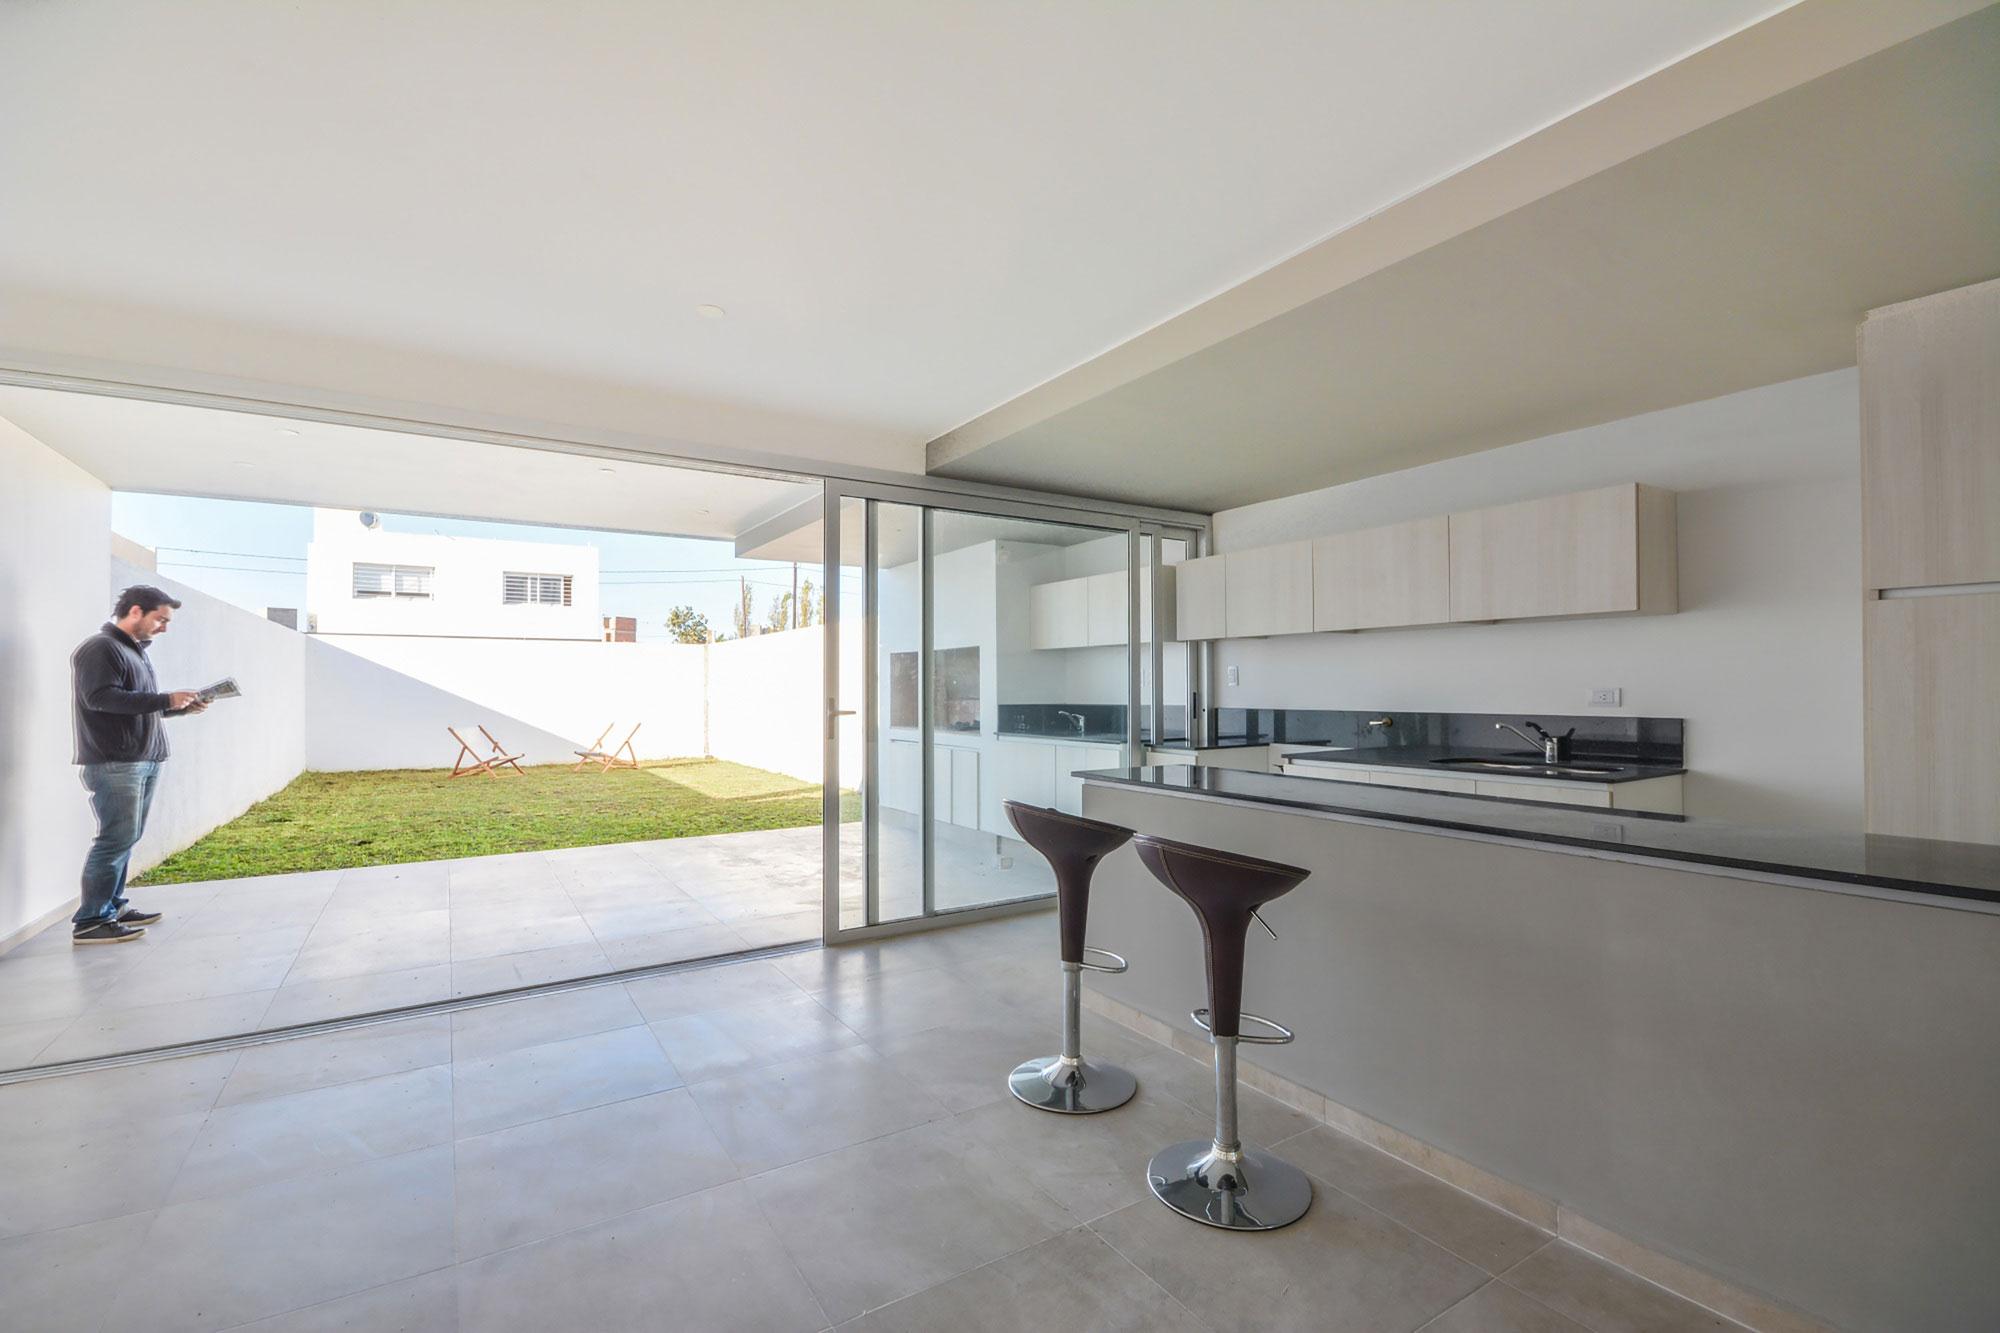 Terraced Houses-Estudio A+3-17